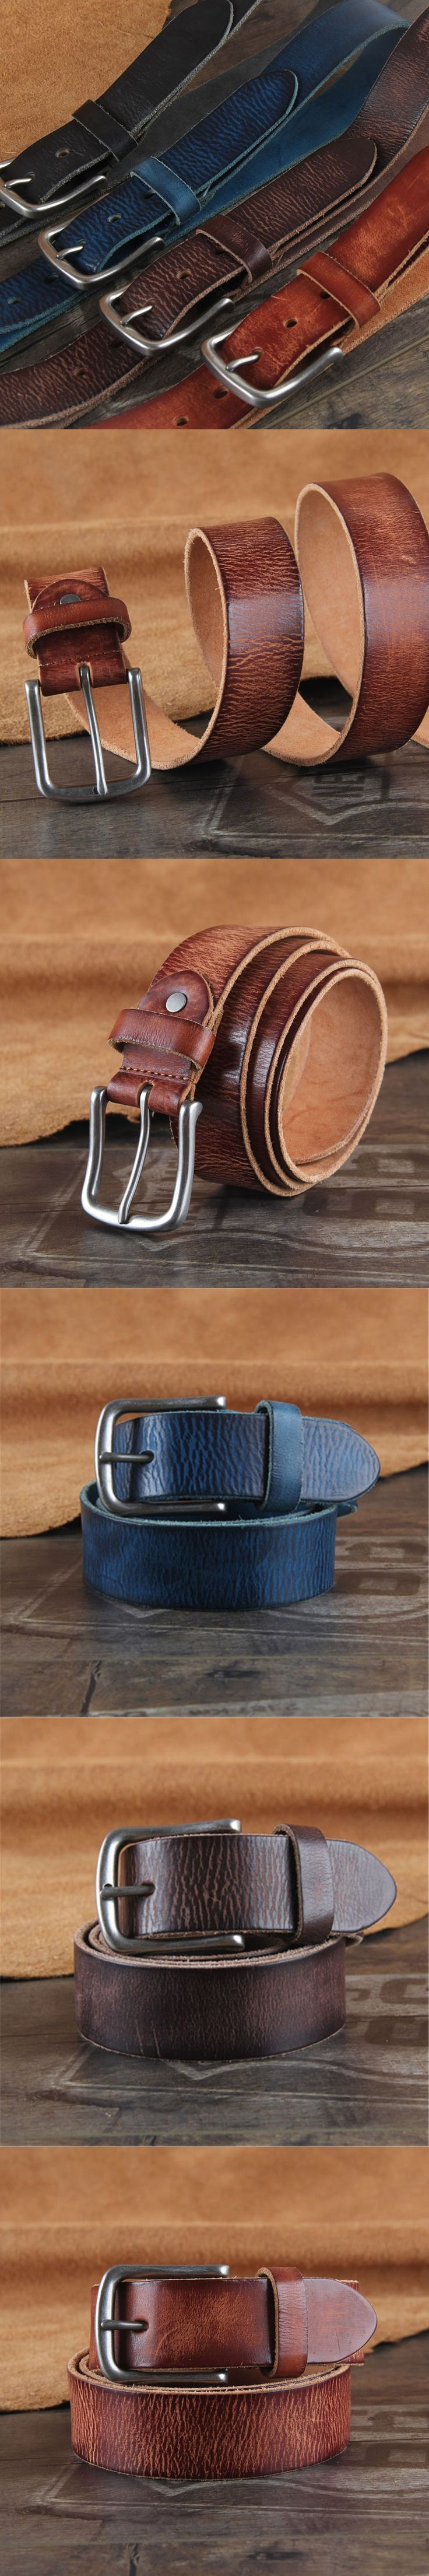 Vintage Belt Buckle Genuine Leather Men Belt Ceinture Homme Cinturones Hombre Top Quality Jeans Blue Belt Wide Strap WMBT0443